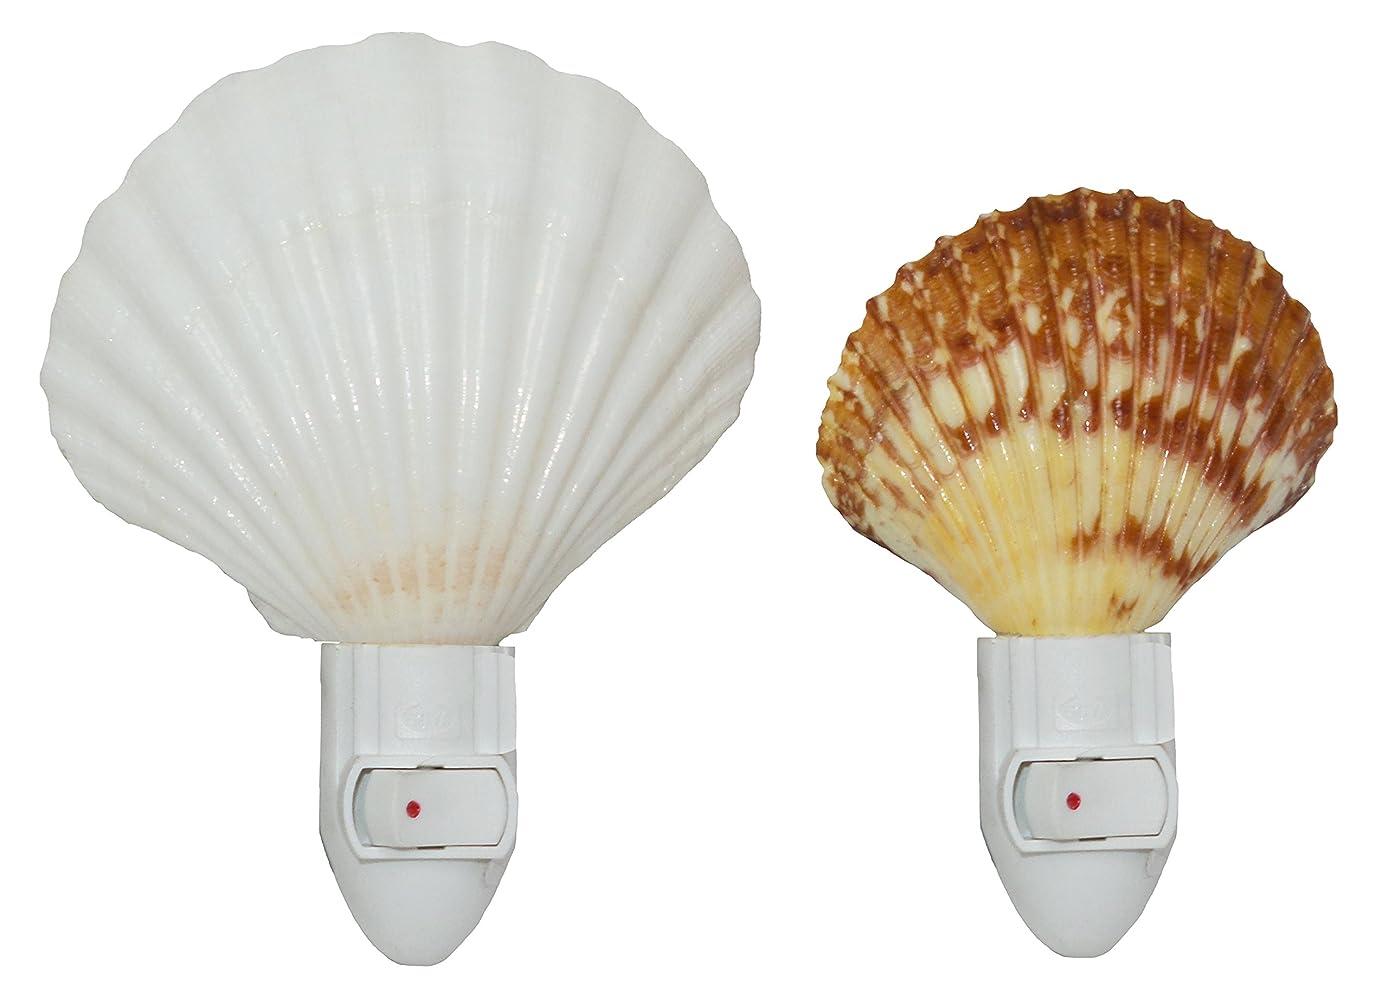 U.S. Shell Seashell Night Light Set of 2 (Irish Deep and Pecten)